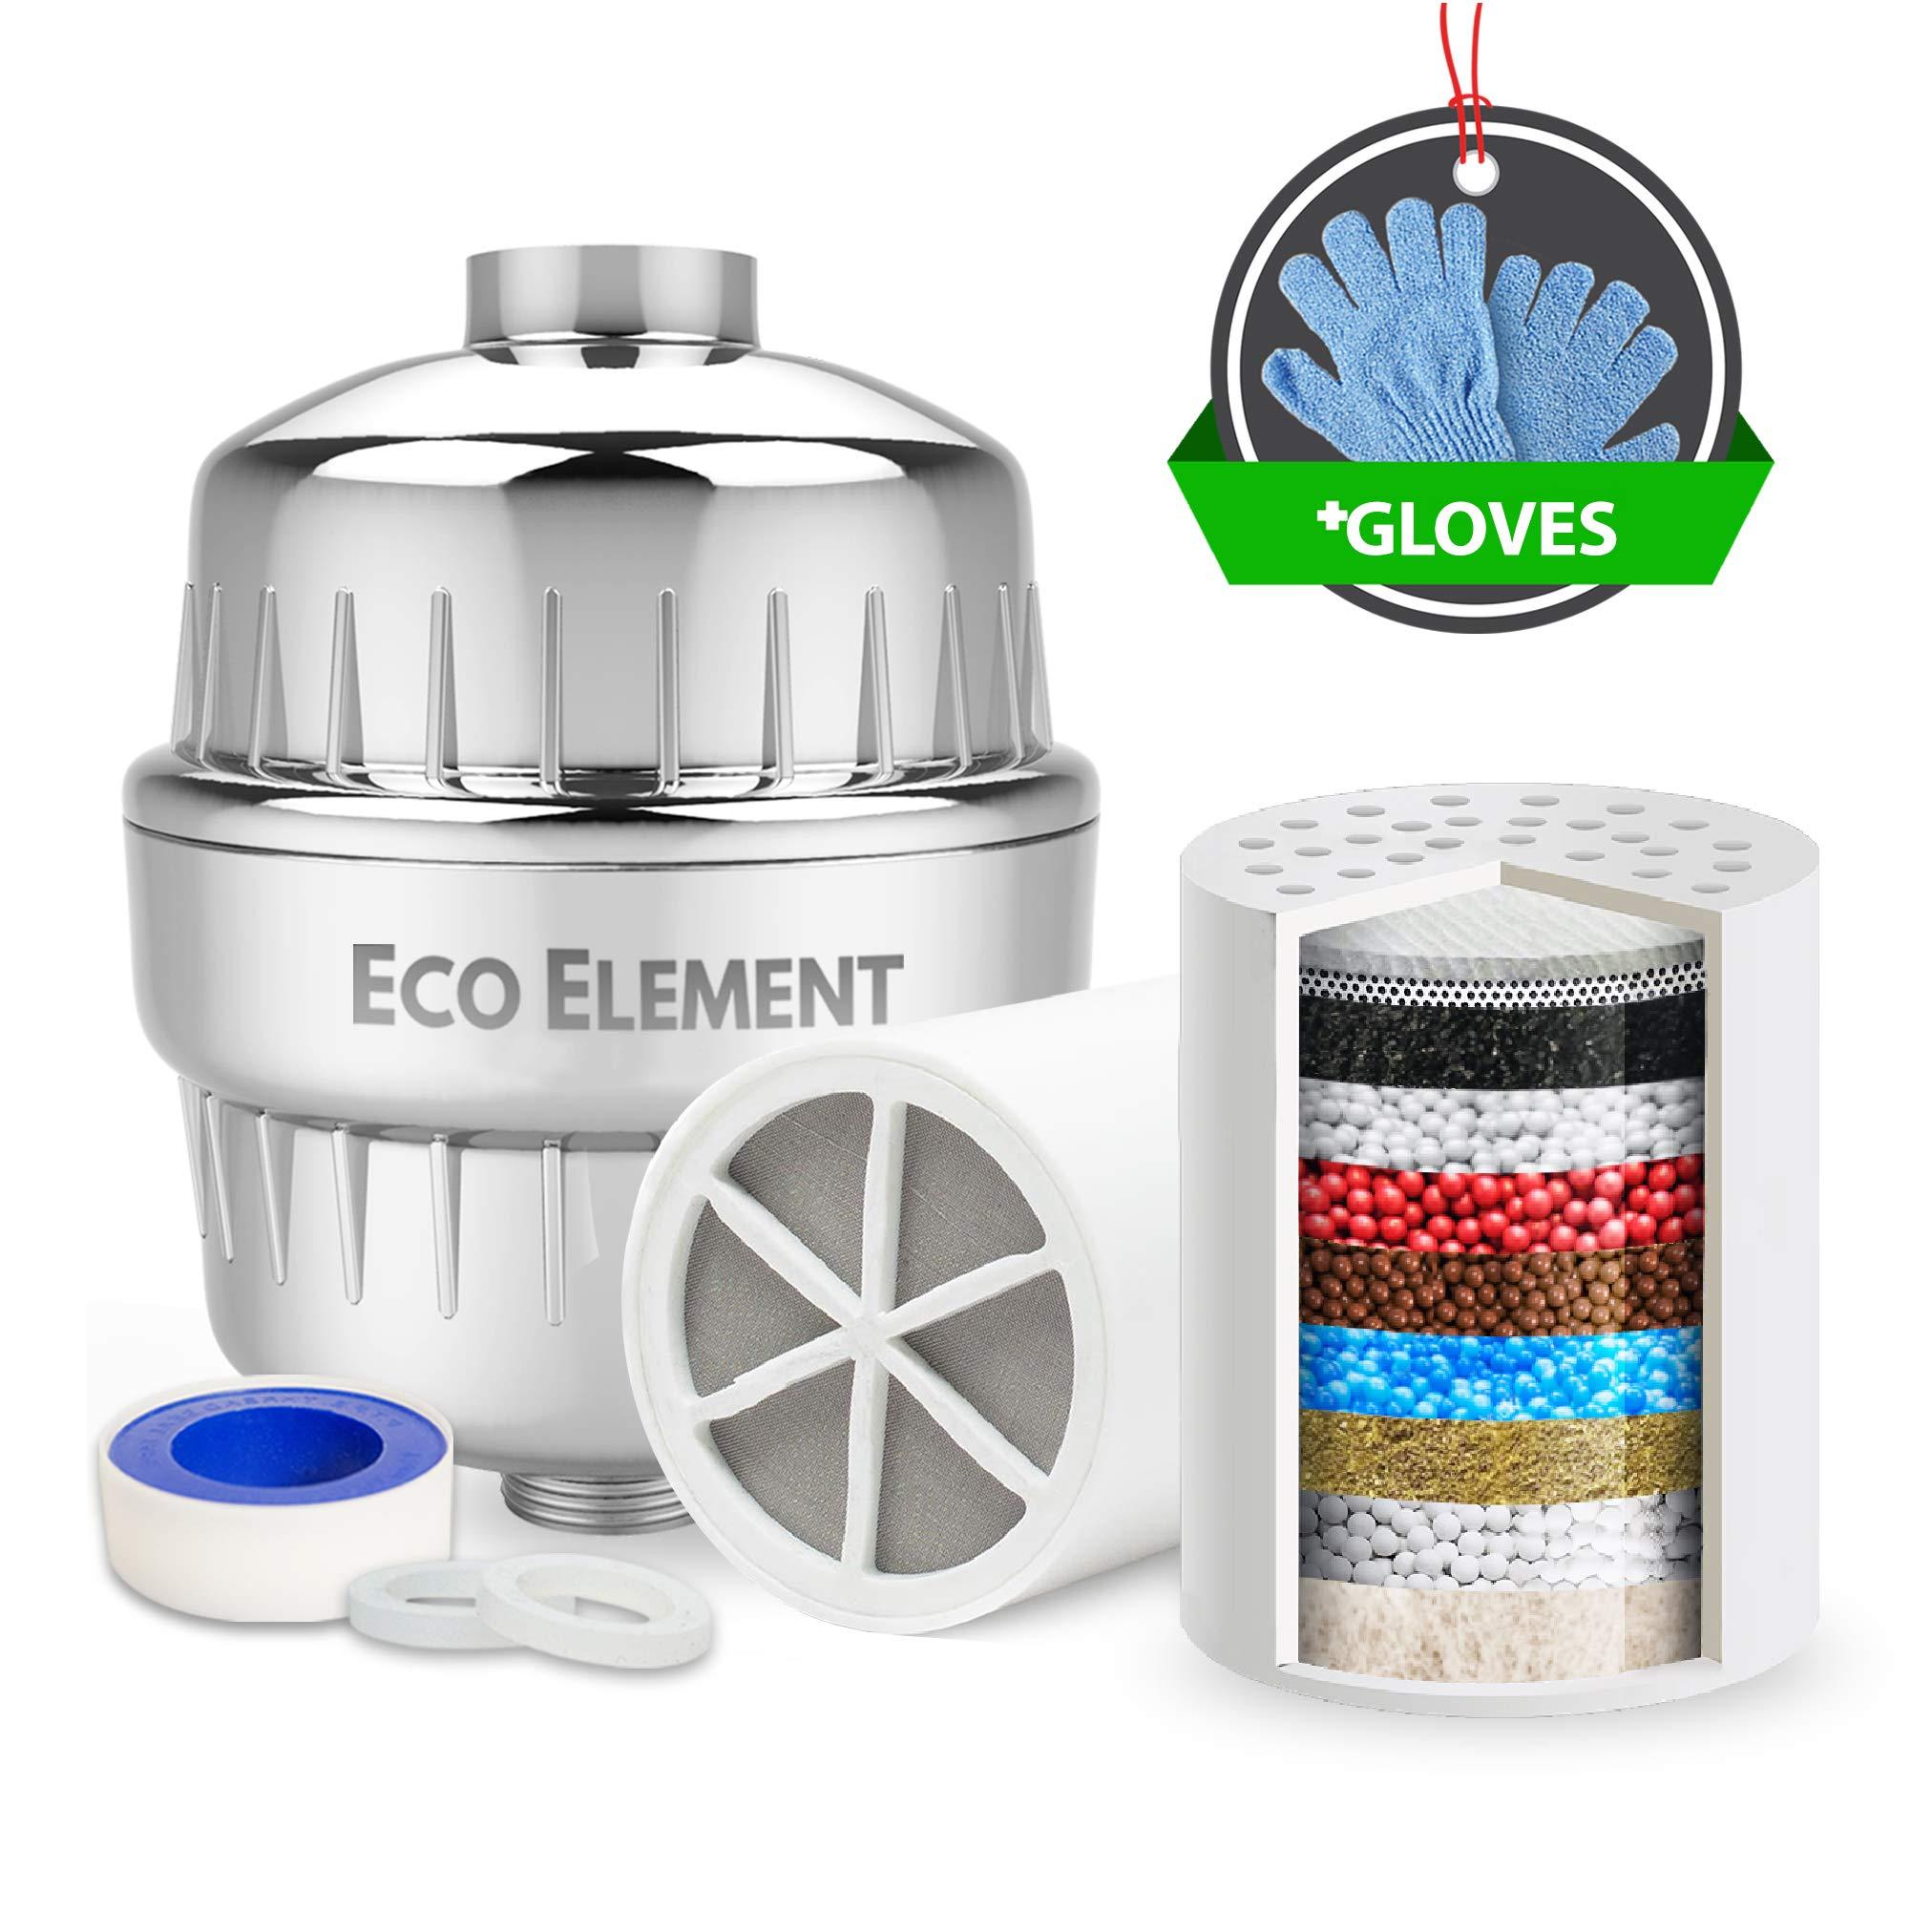 Eco Element Universal-Duschfilter. Erweiterte Filtration Einfache Einstellung. (Enthält 2 Filterpatronen + Chrome Shell + Teflonband + Scheibenringe + Duschwaschhandschuhe)